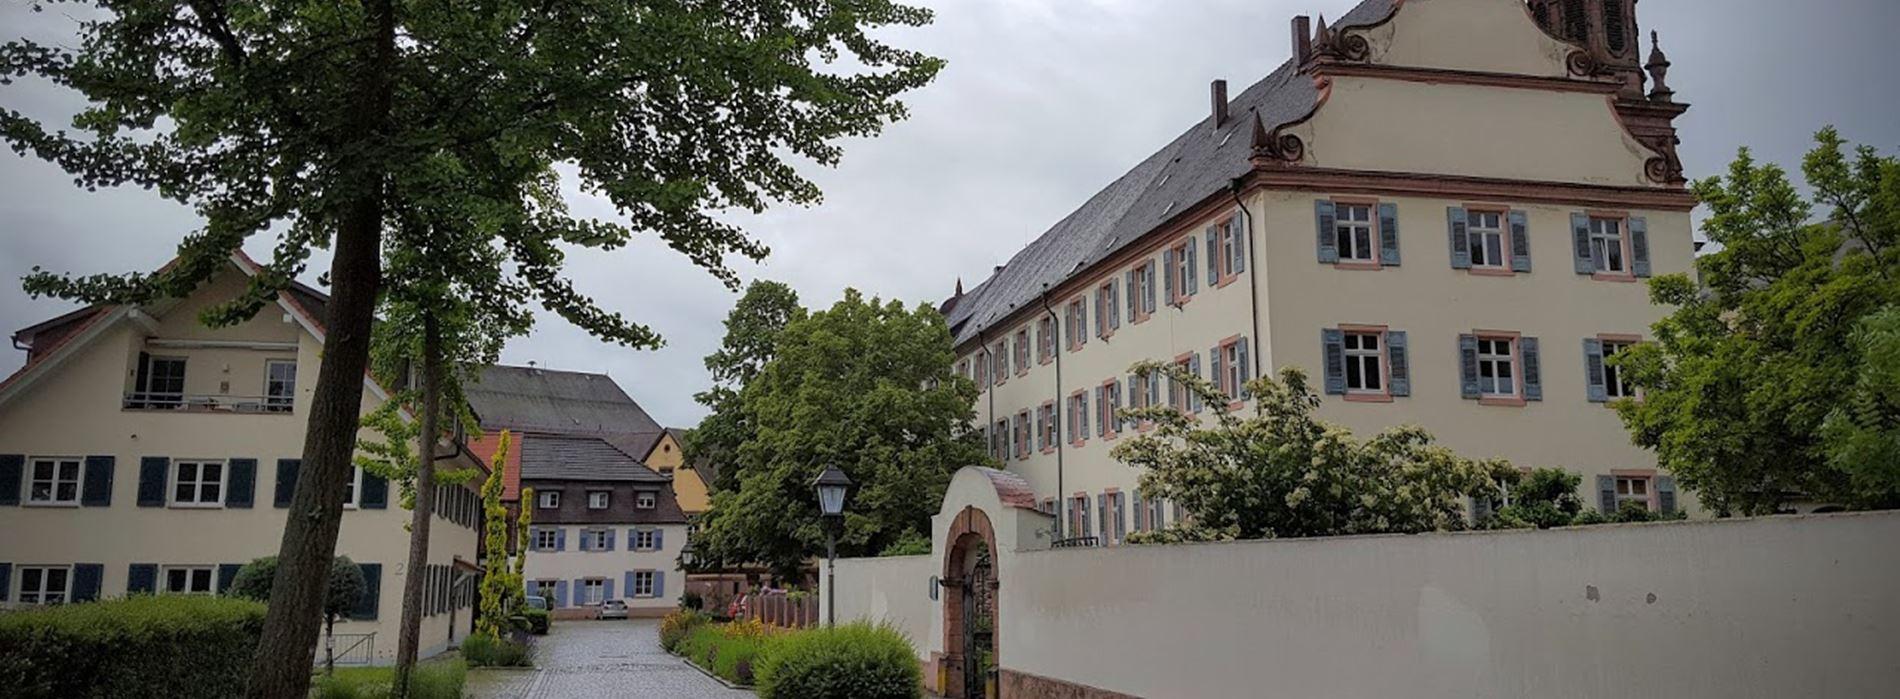 Kloster Gengenbach Kinzigtal Harmersbachtal